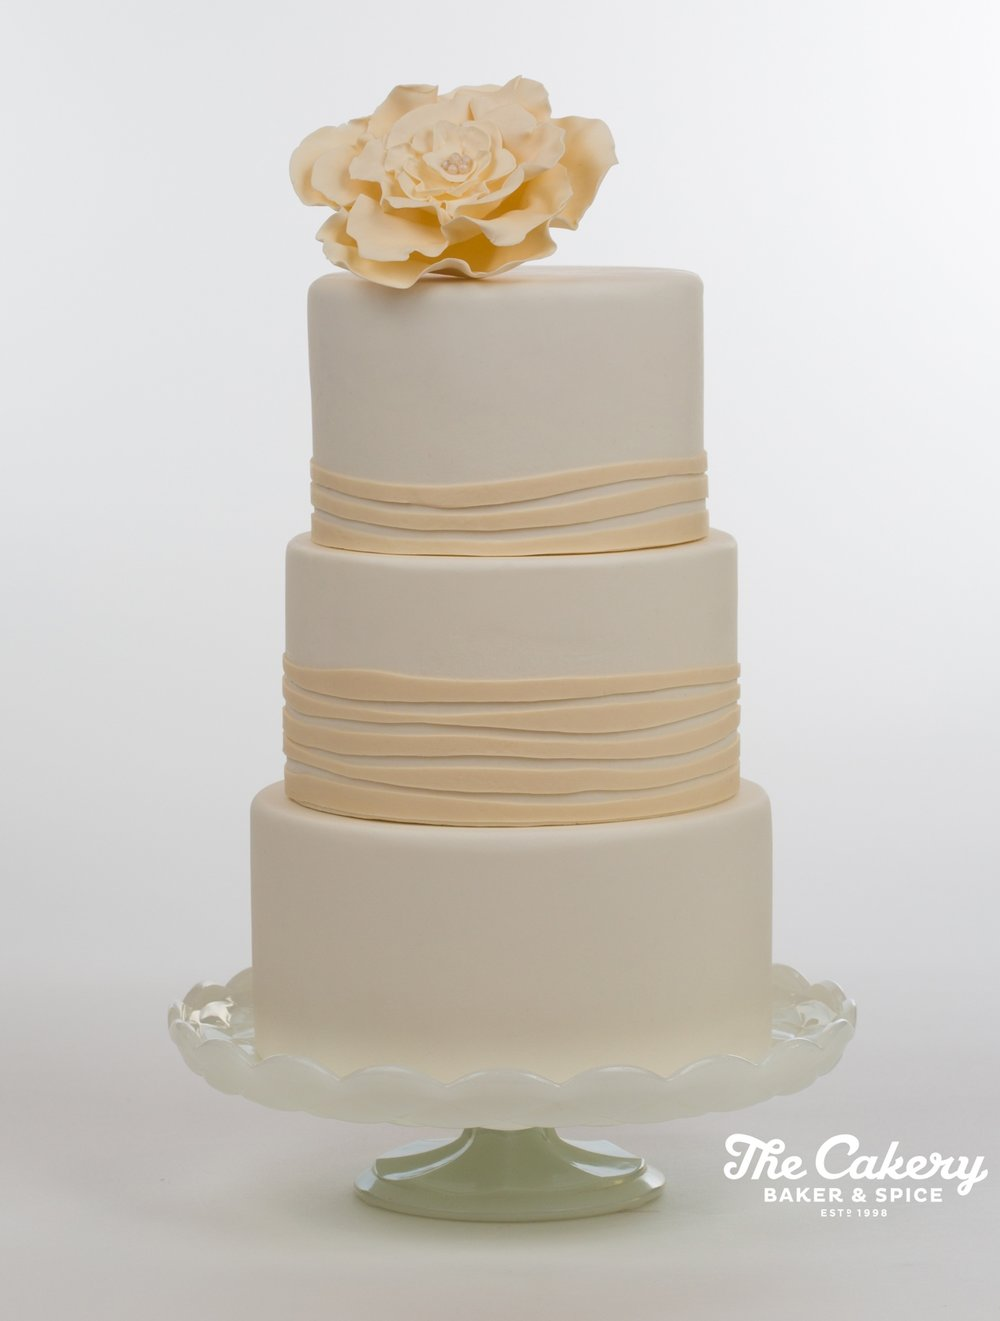 Baker and Spice - Wedding Cakes - 00174 logo2.jpg